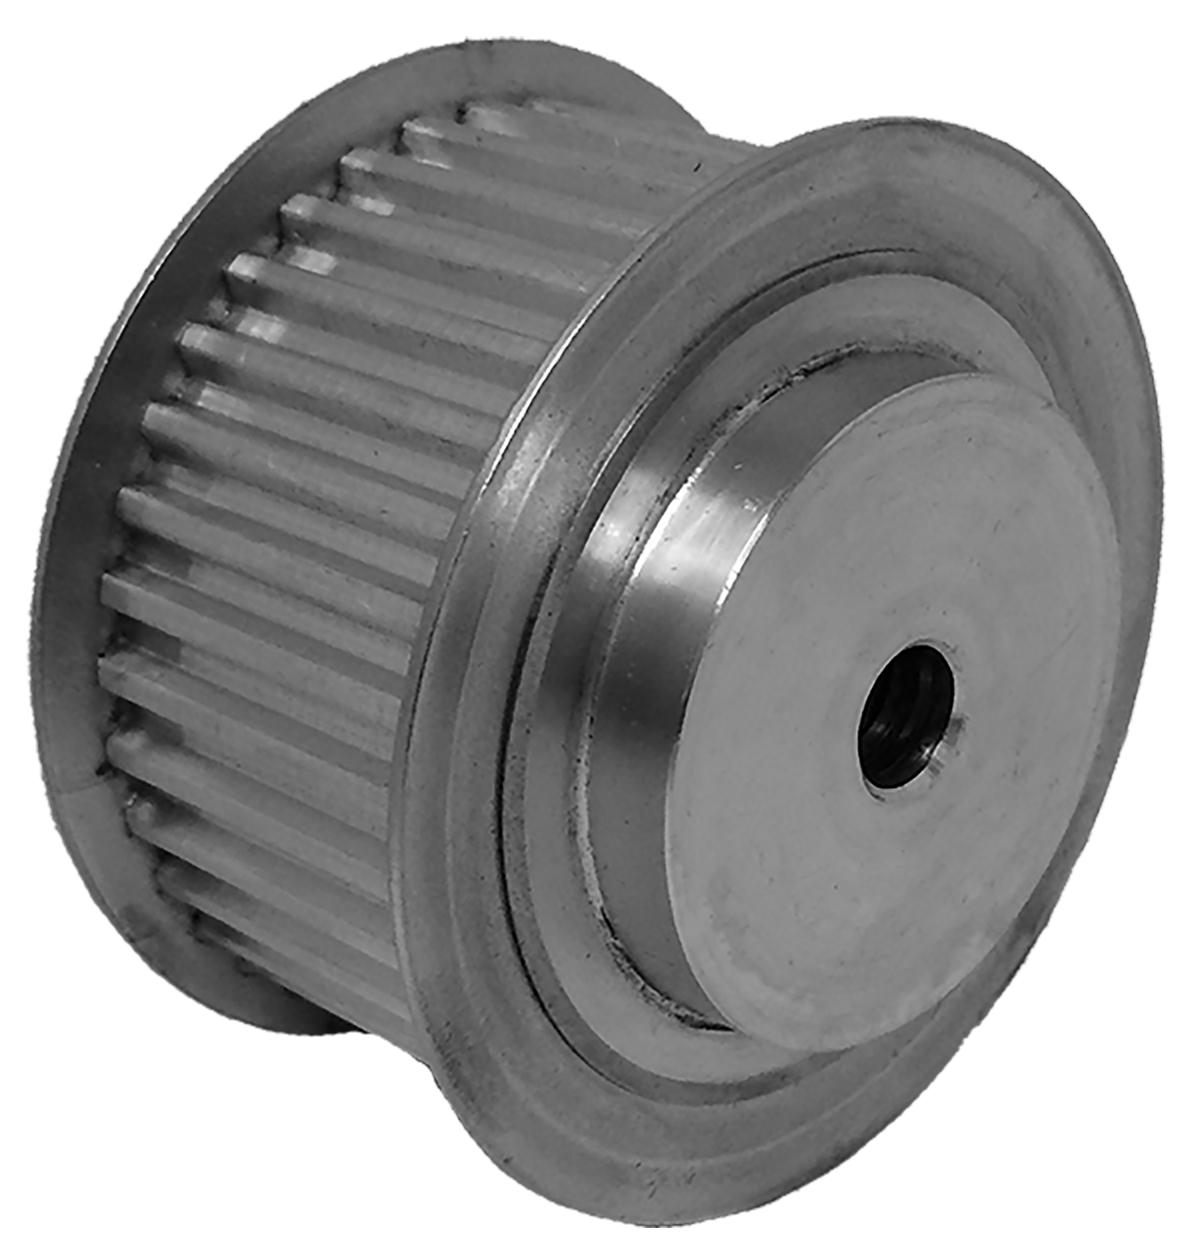 36T5/36-2 - Aluminum Metric Pulleys